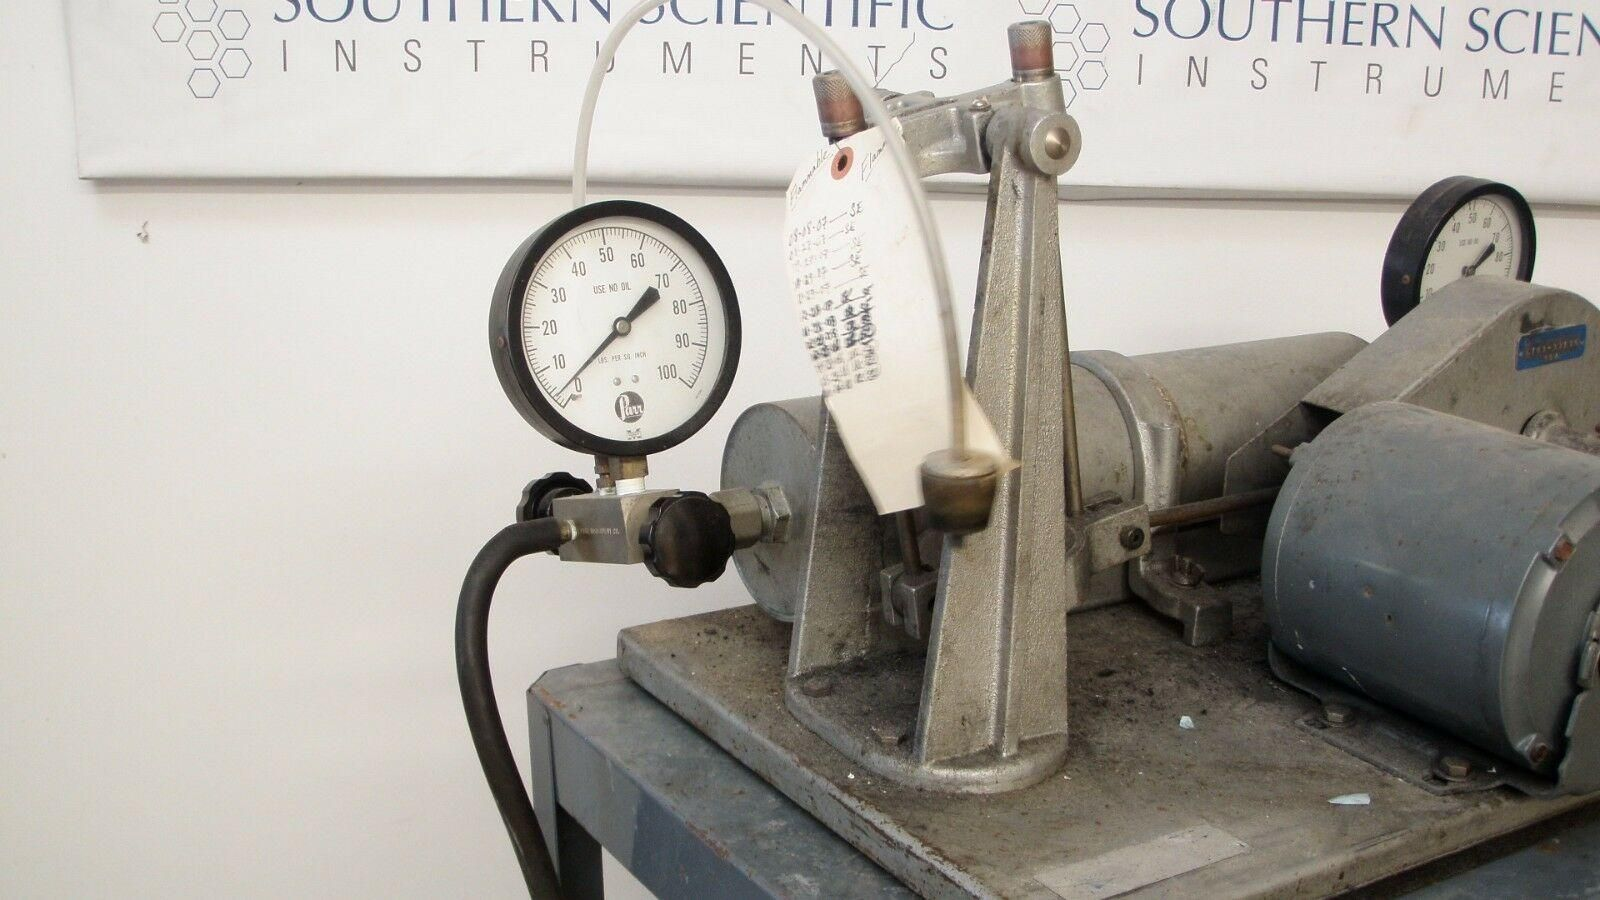 Parr Shaker Reactor Hydrogenation Apparatus 3911